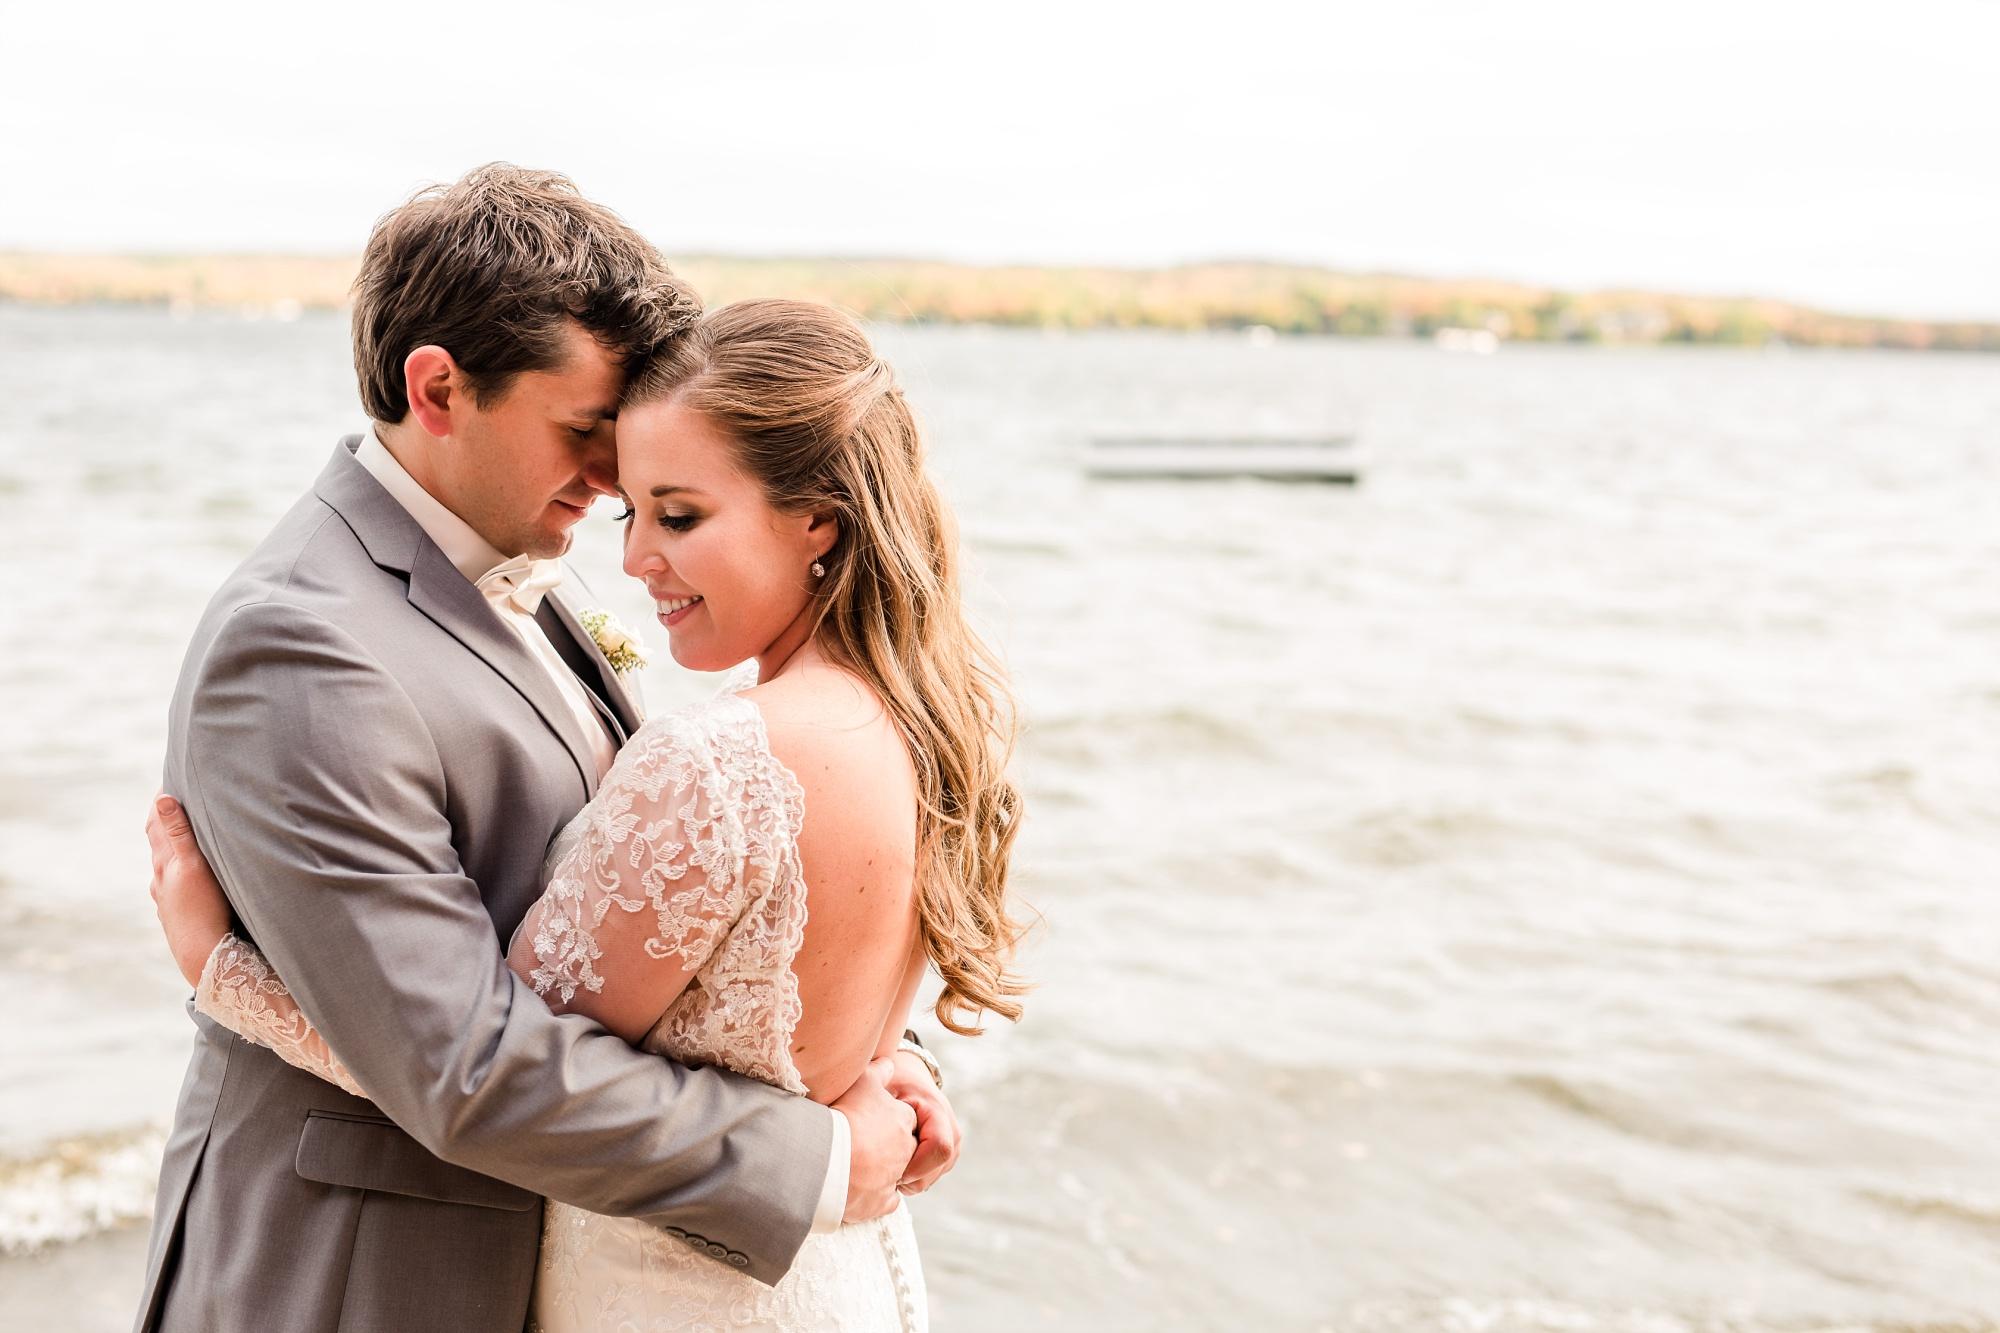 AmberLangerudPhotography_Fair Hills Resort Lakeside Wedding in Minnesota_3475.jpg